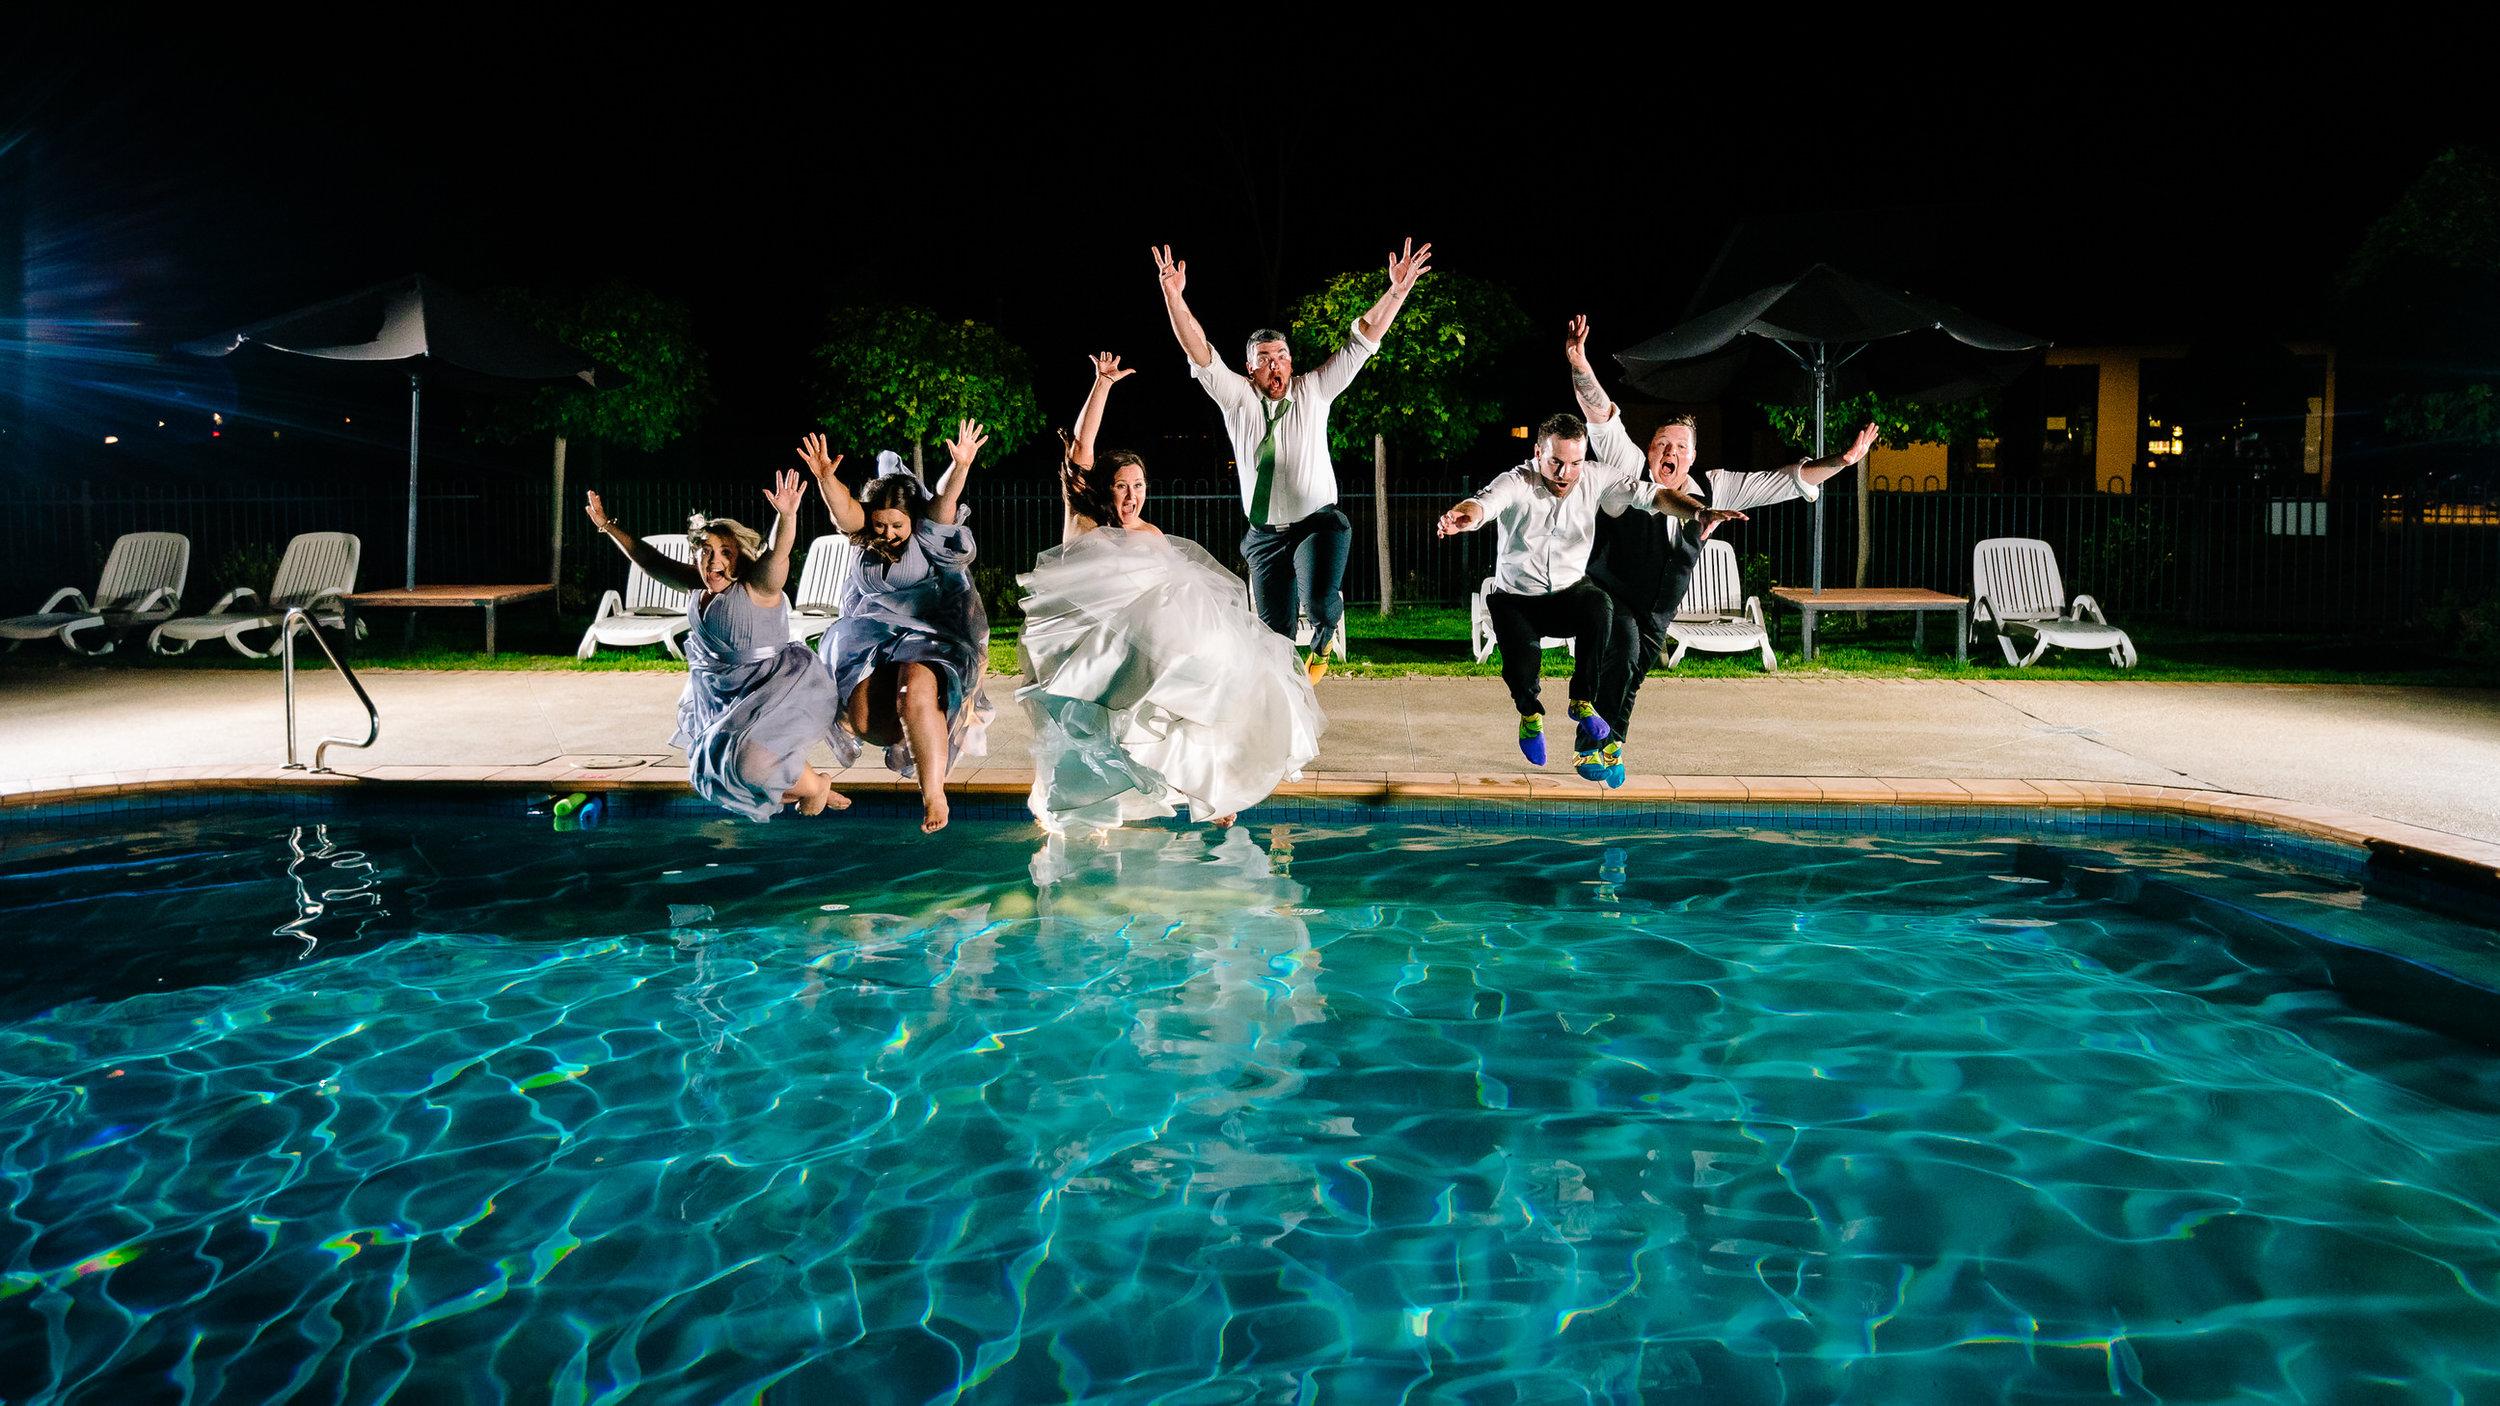 Justin_Jim_Echuca_Wedding_Photography_Tindarra-365.JPG